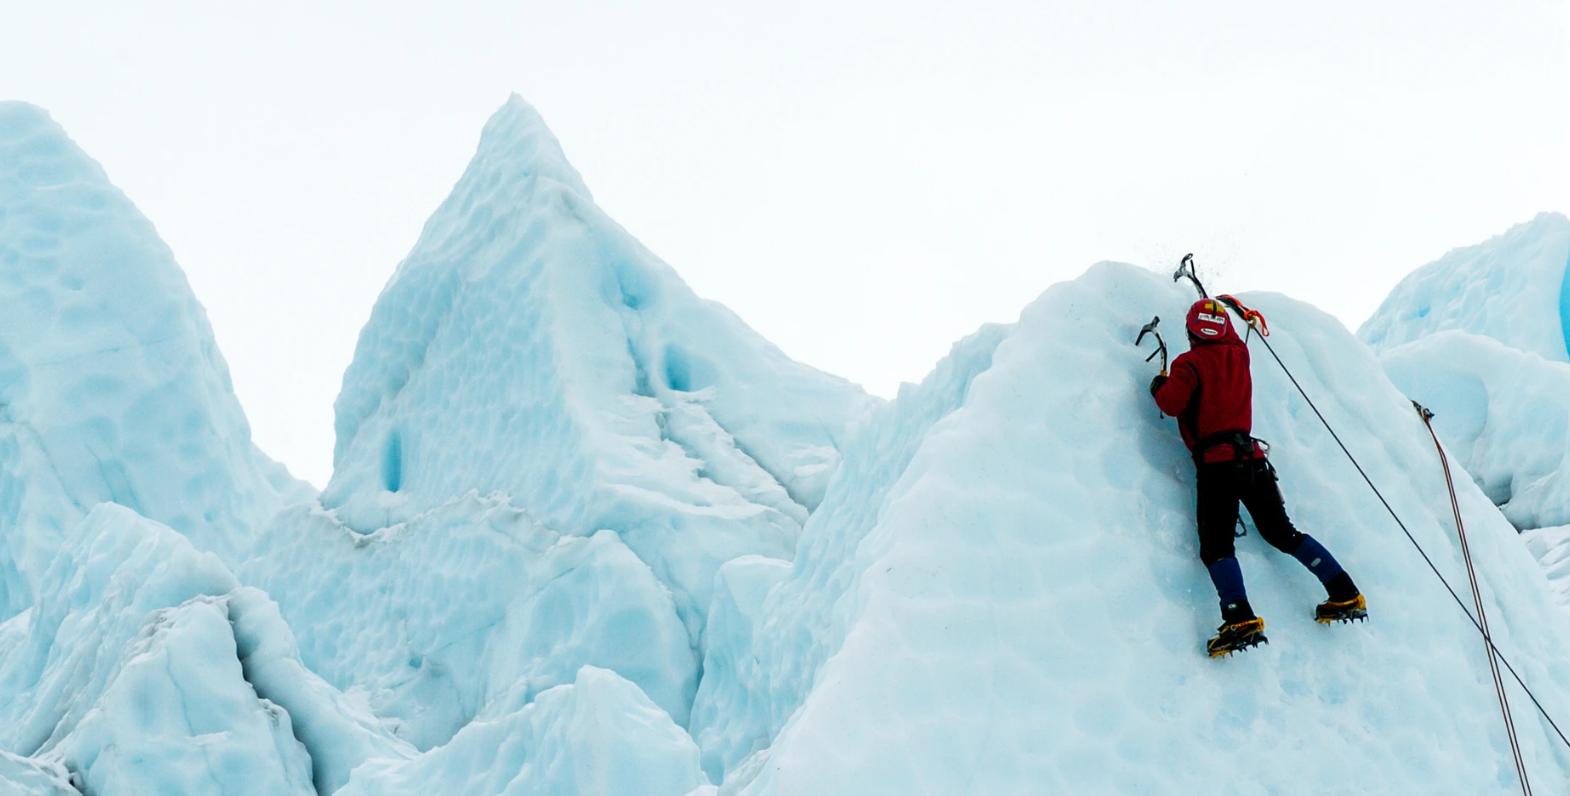 Man climbing ice wall